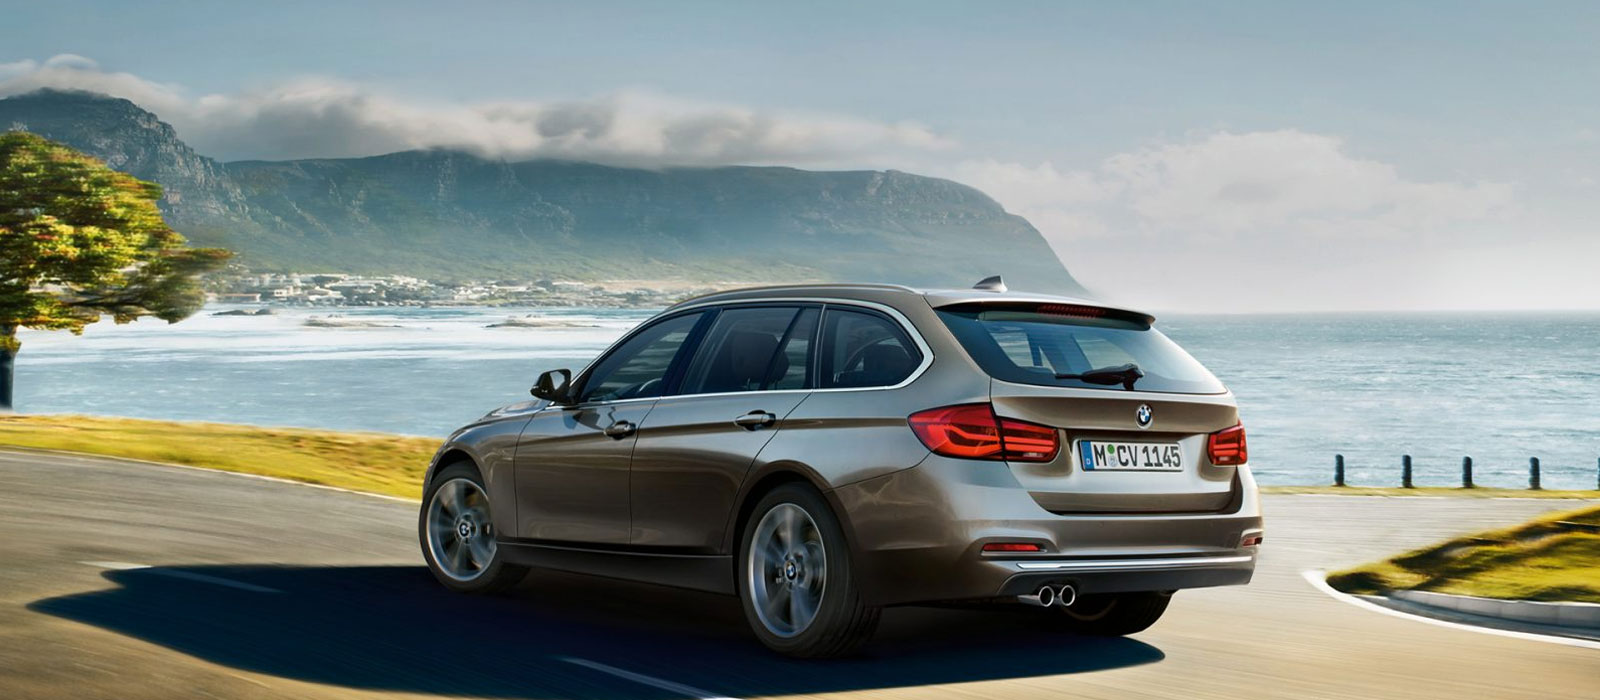 BMW Wagner - BMW 320d Touring Angebot